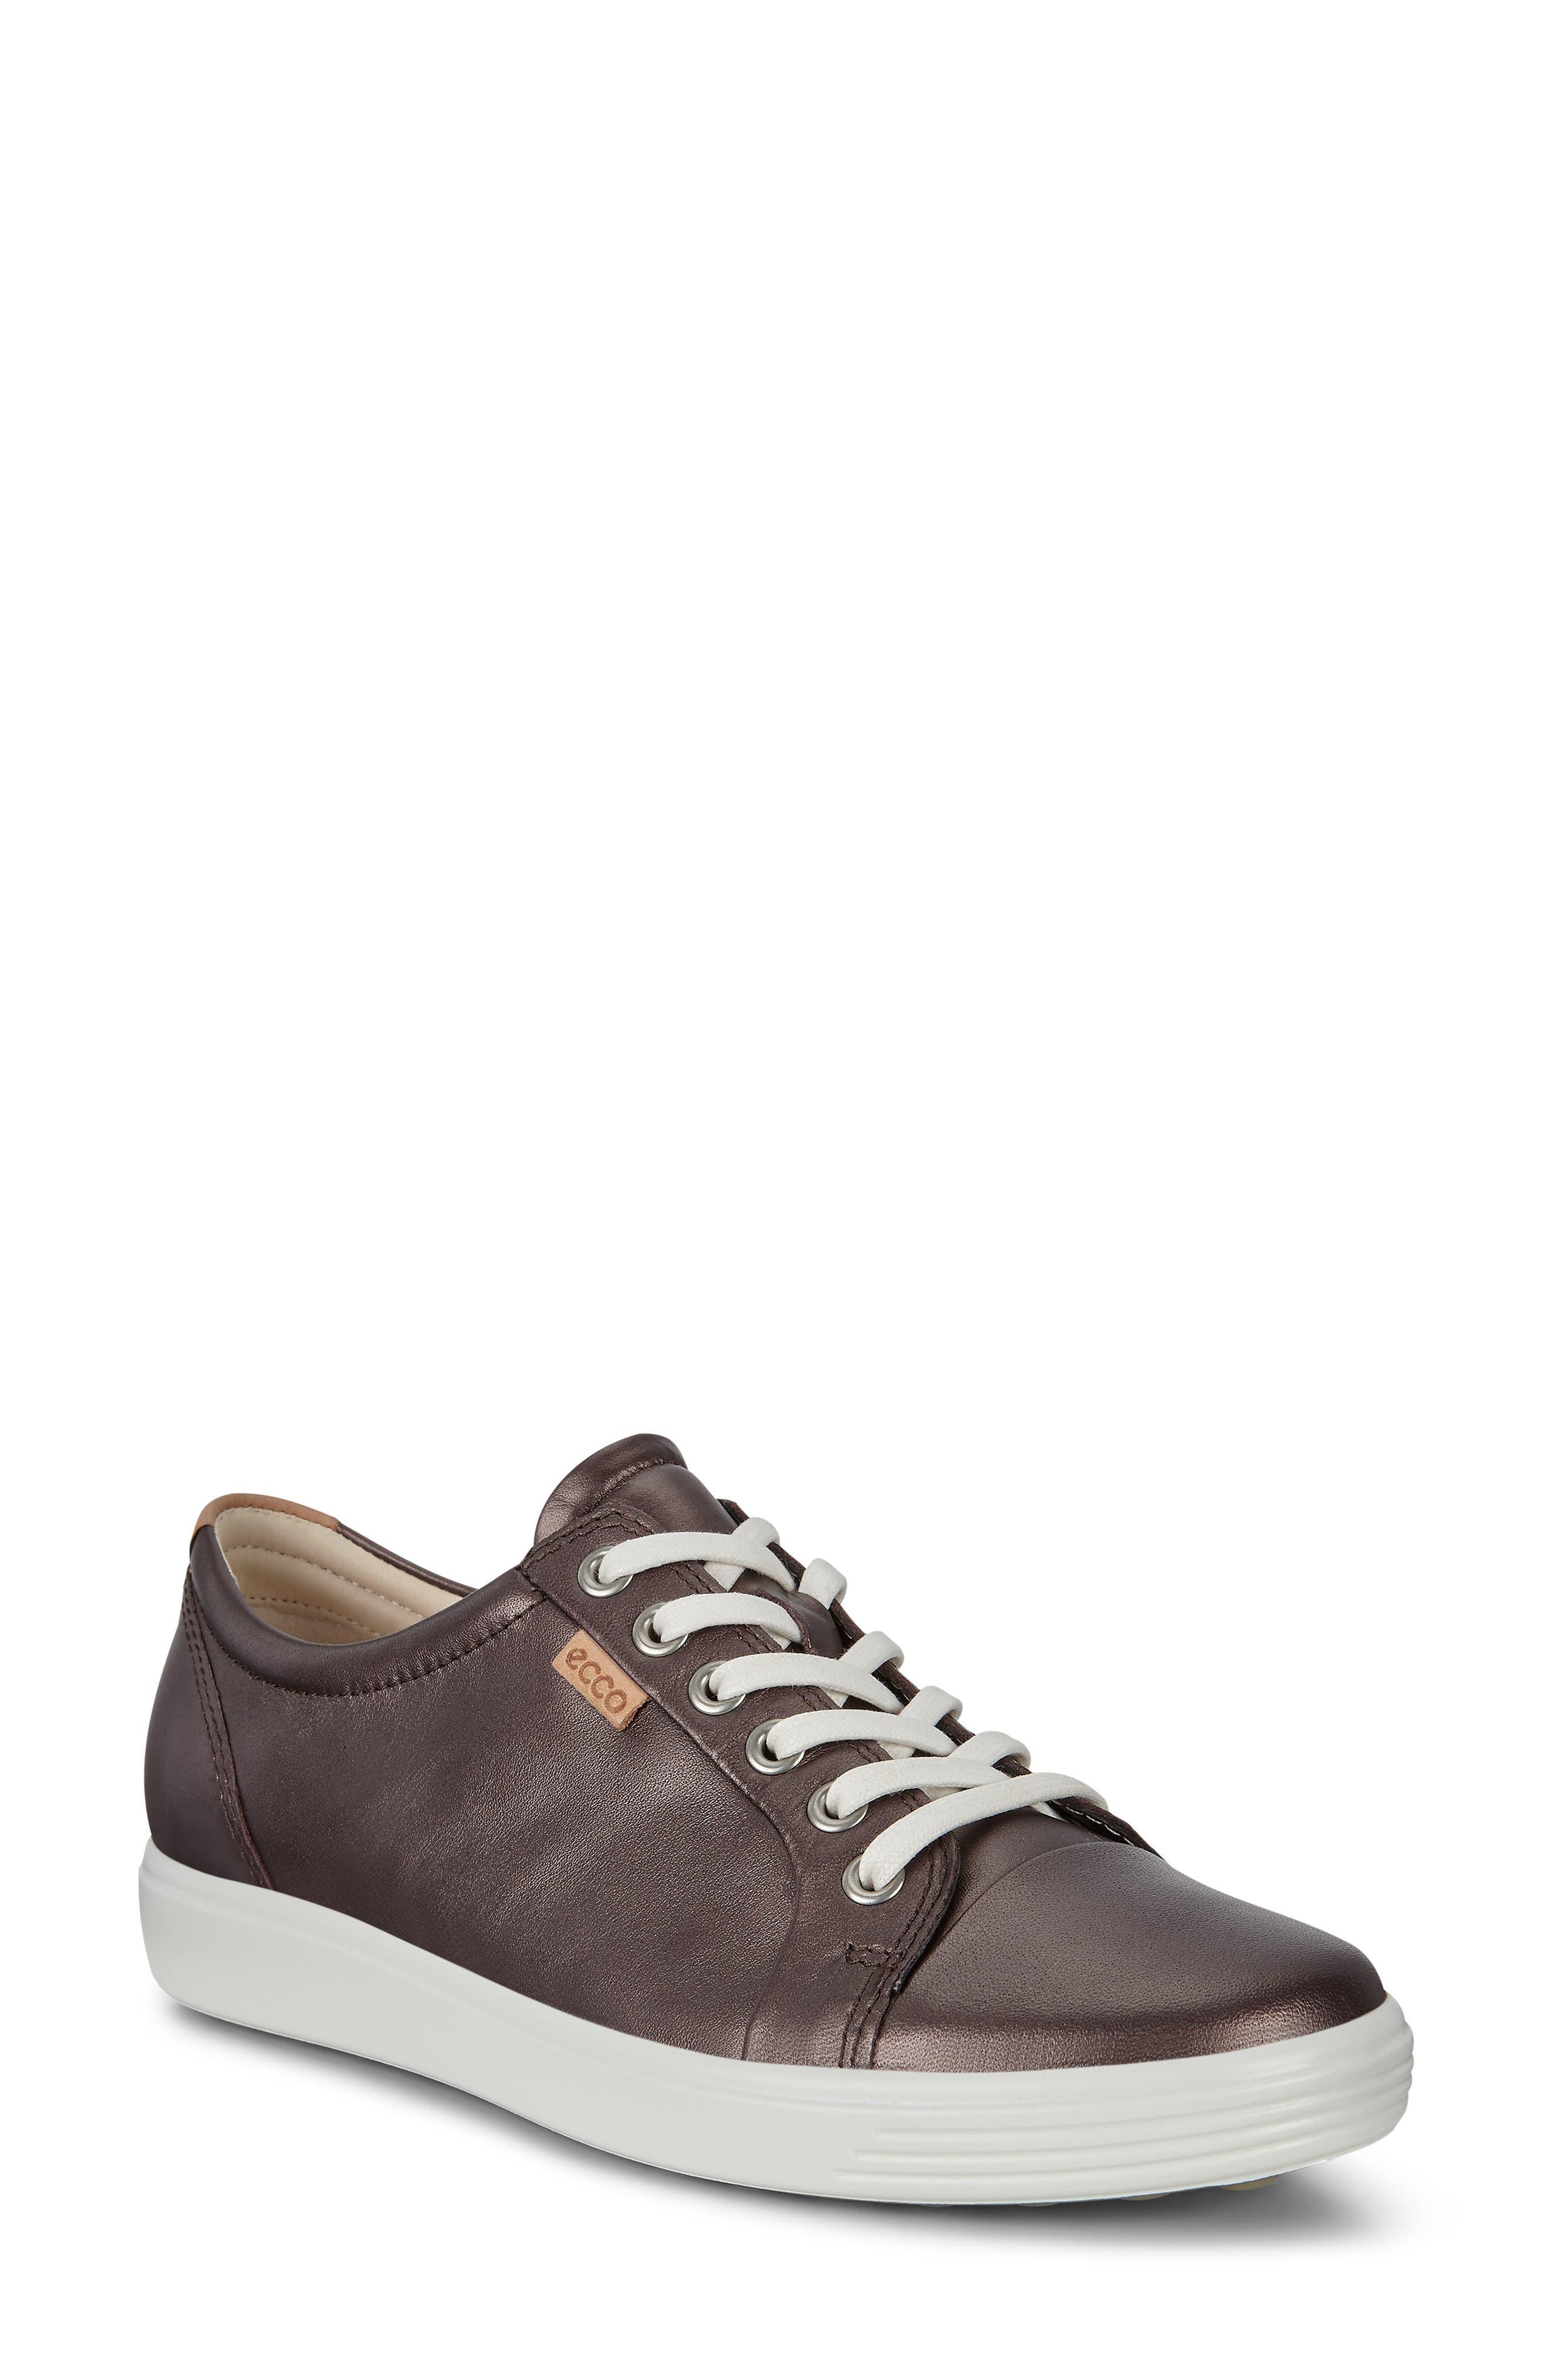 ECCO Women's Ecco Soft 7 Sneaker, Size 5-5.5US - Burgundy